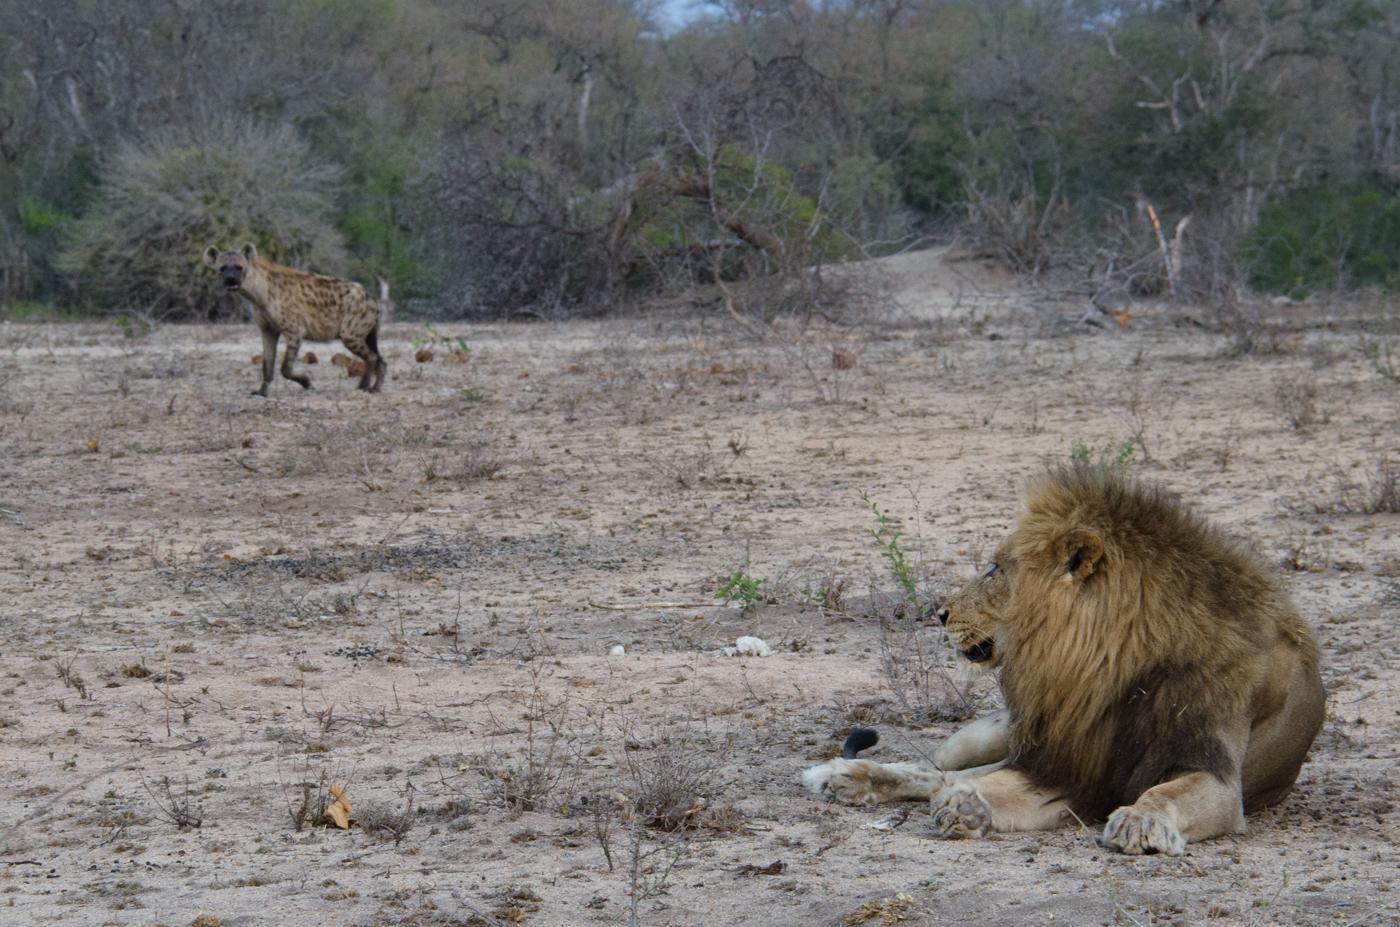 matimba-and-hyena-kp